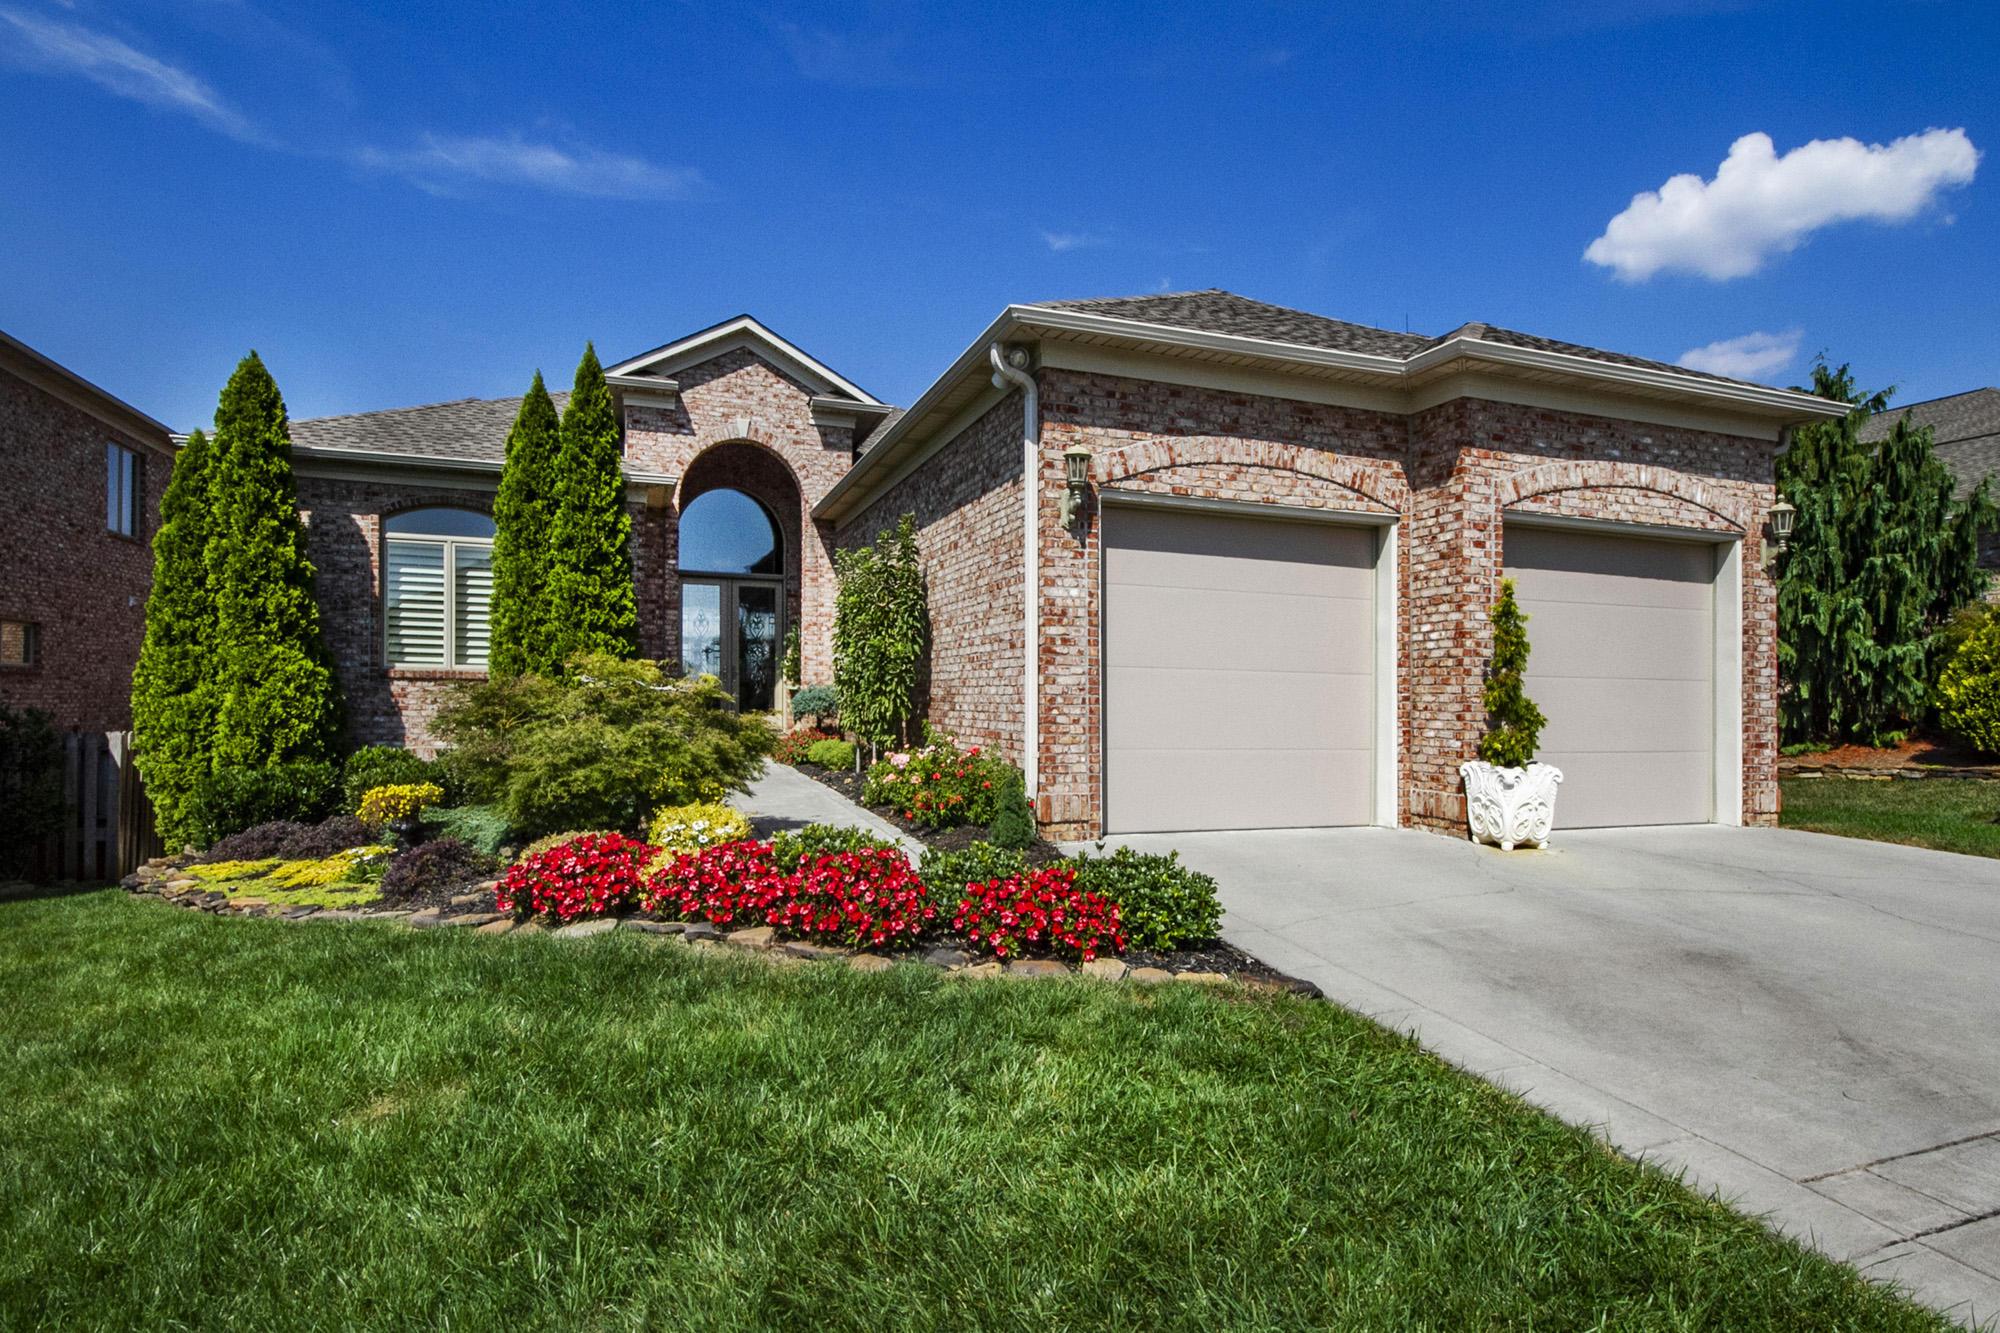 12651 Ridgepath Lane, Knoxville, Tennessee 37922, 4 Bedrooms Bedrooms, ,4 BathroomsBathrooms,Single Family,For Sale,Ridgepath,1097478